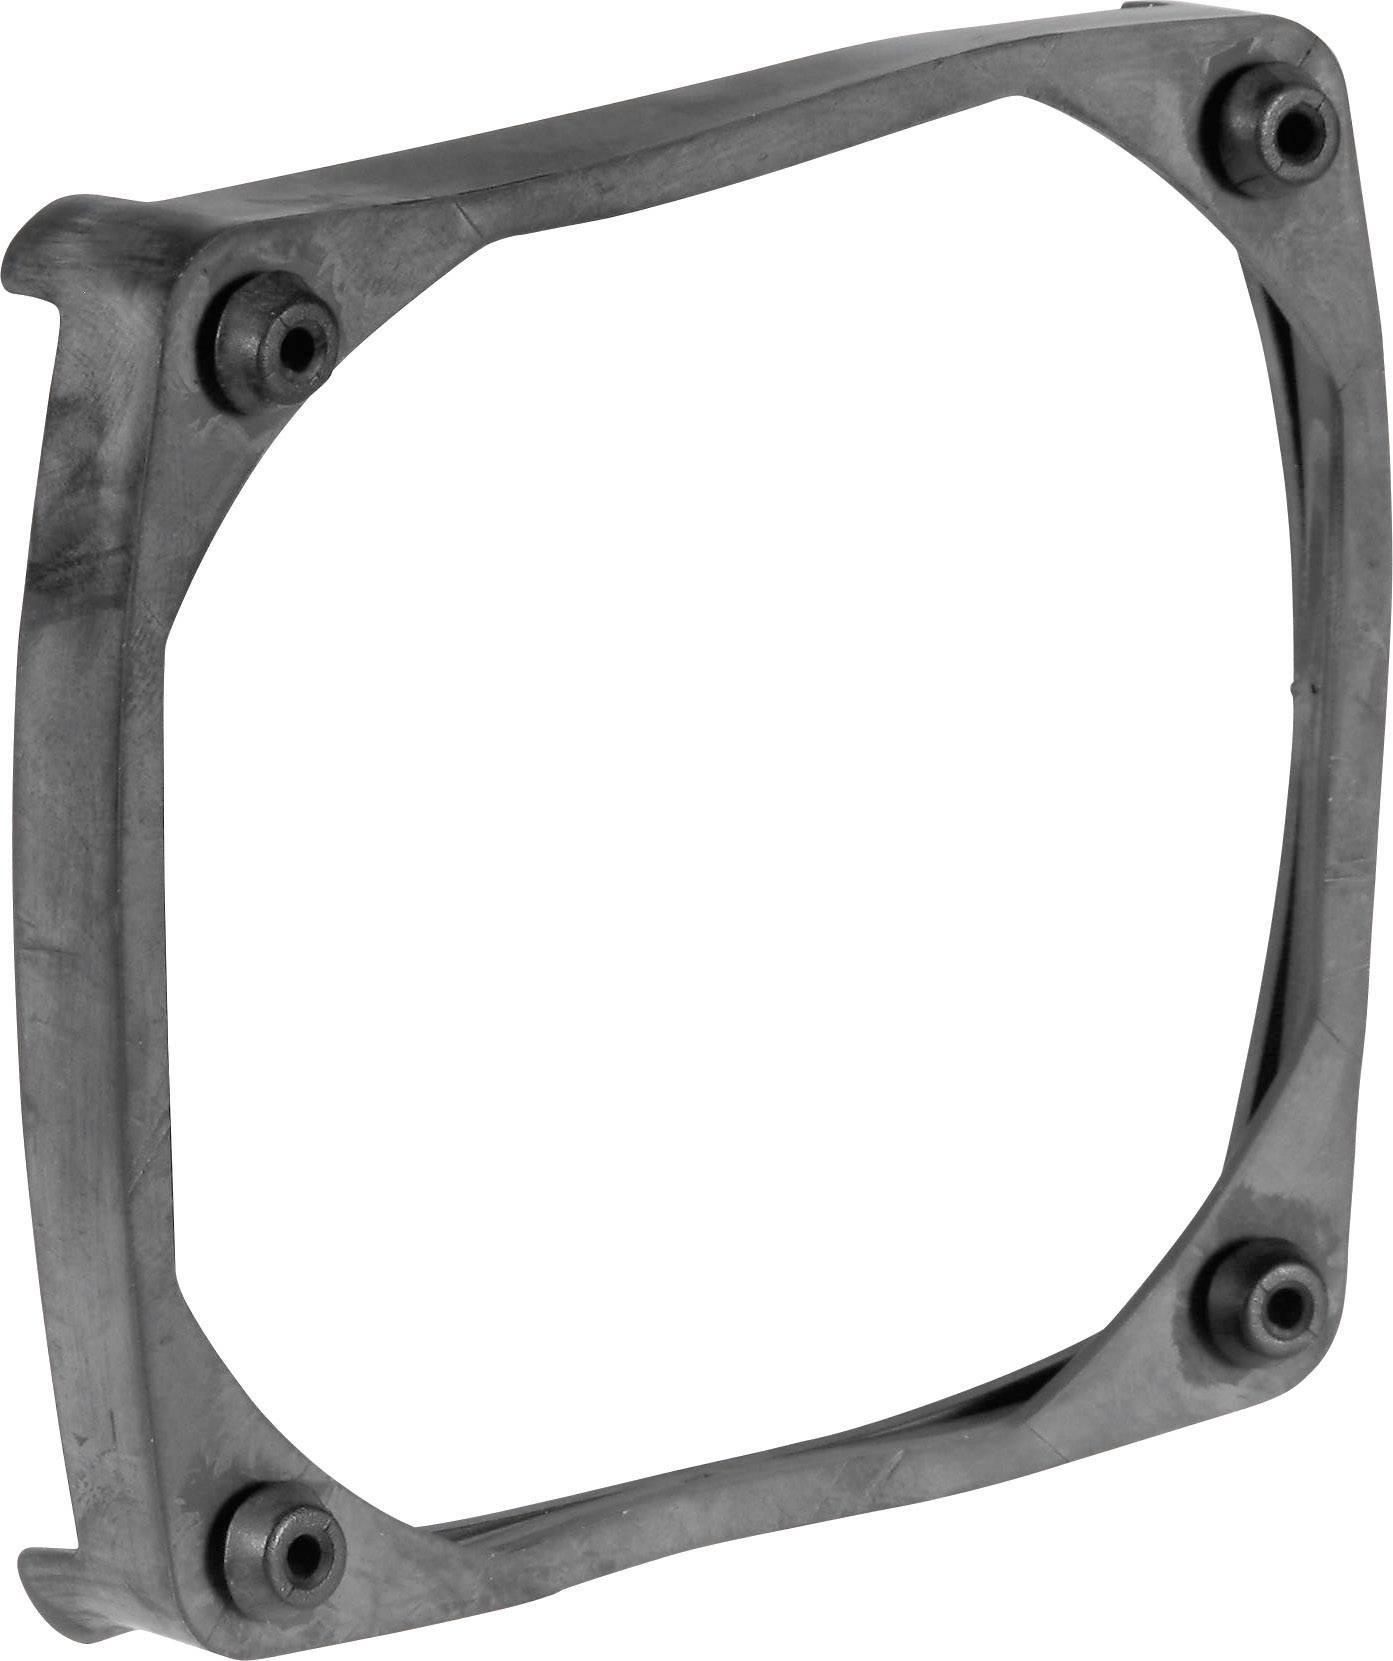 SEPA;956073020, (š x v x h) 64 x 64 x 7.5 mm, 1 ks, elastomér